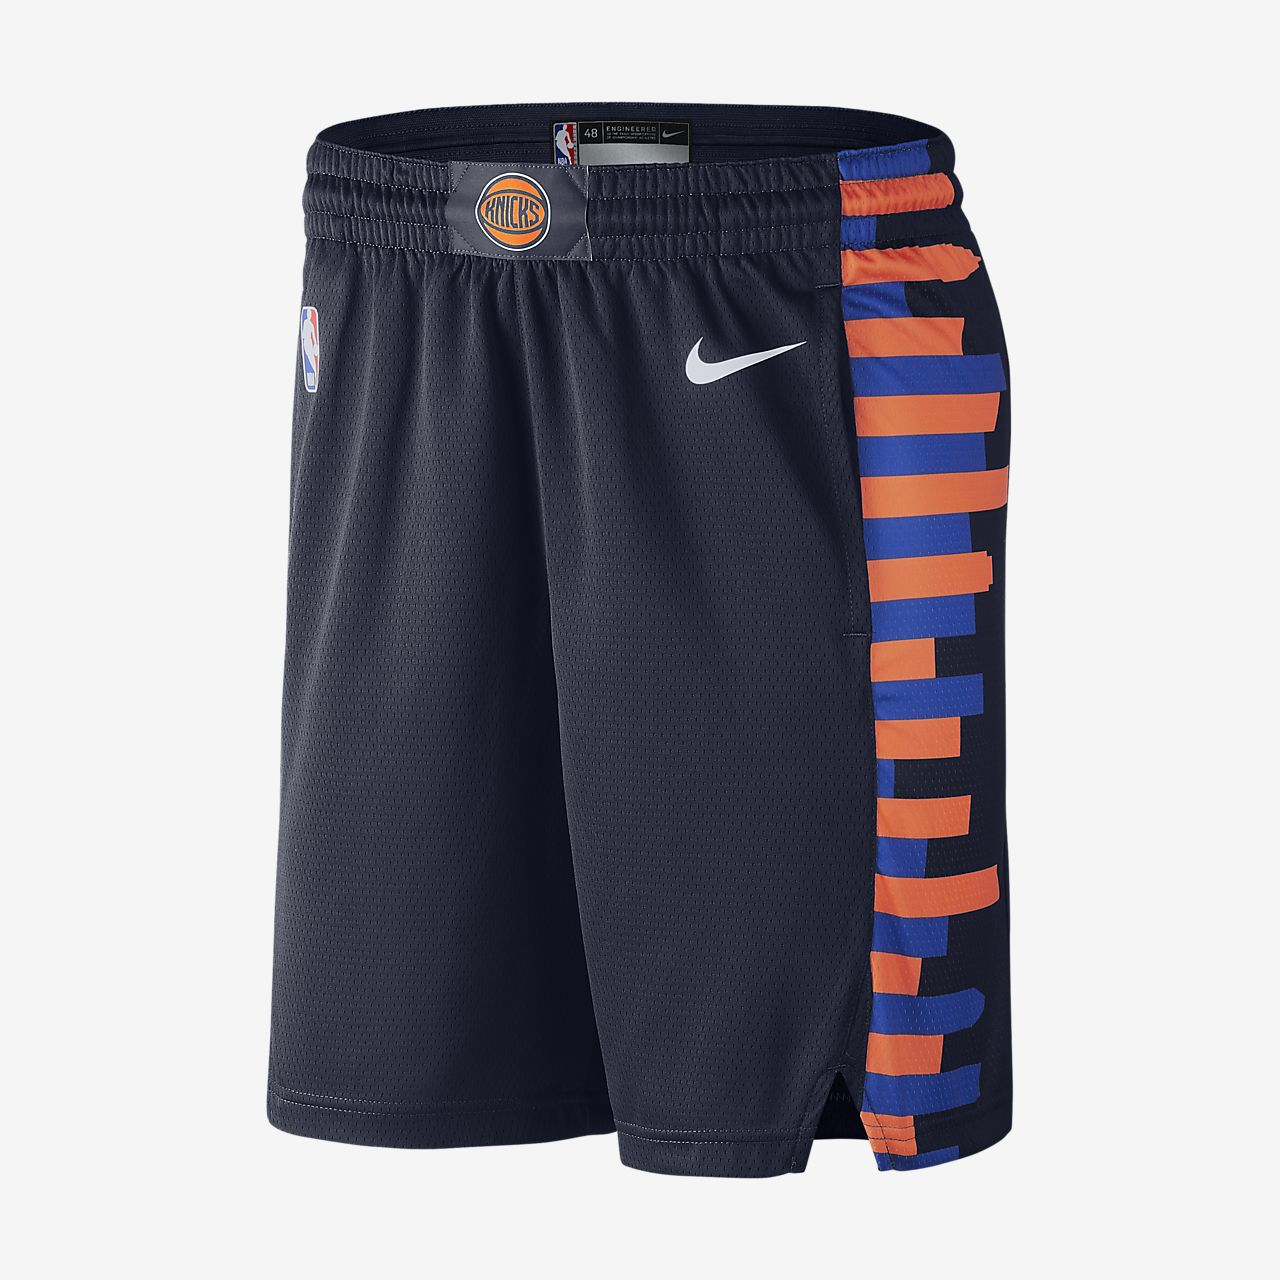 86a8fb7391a New York Knicks City Edition Swingman Men s Nike NBA Shorts. Nike.com FI